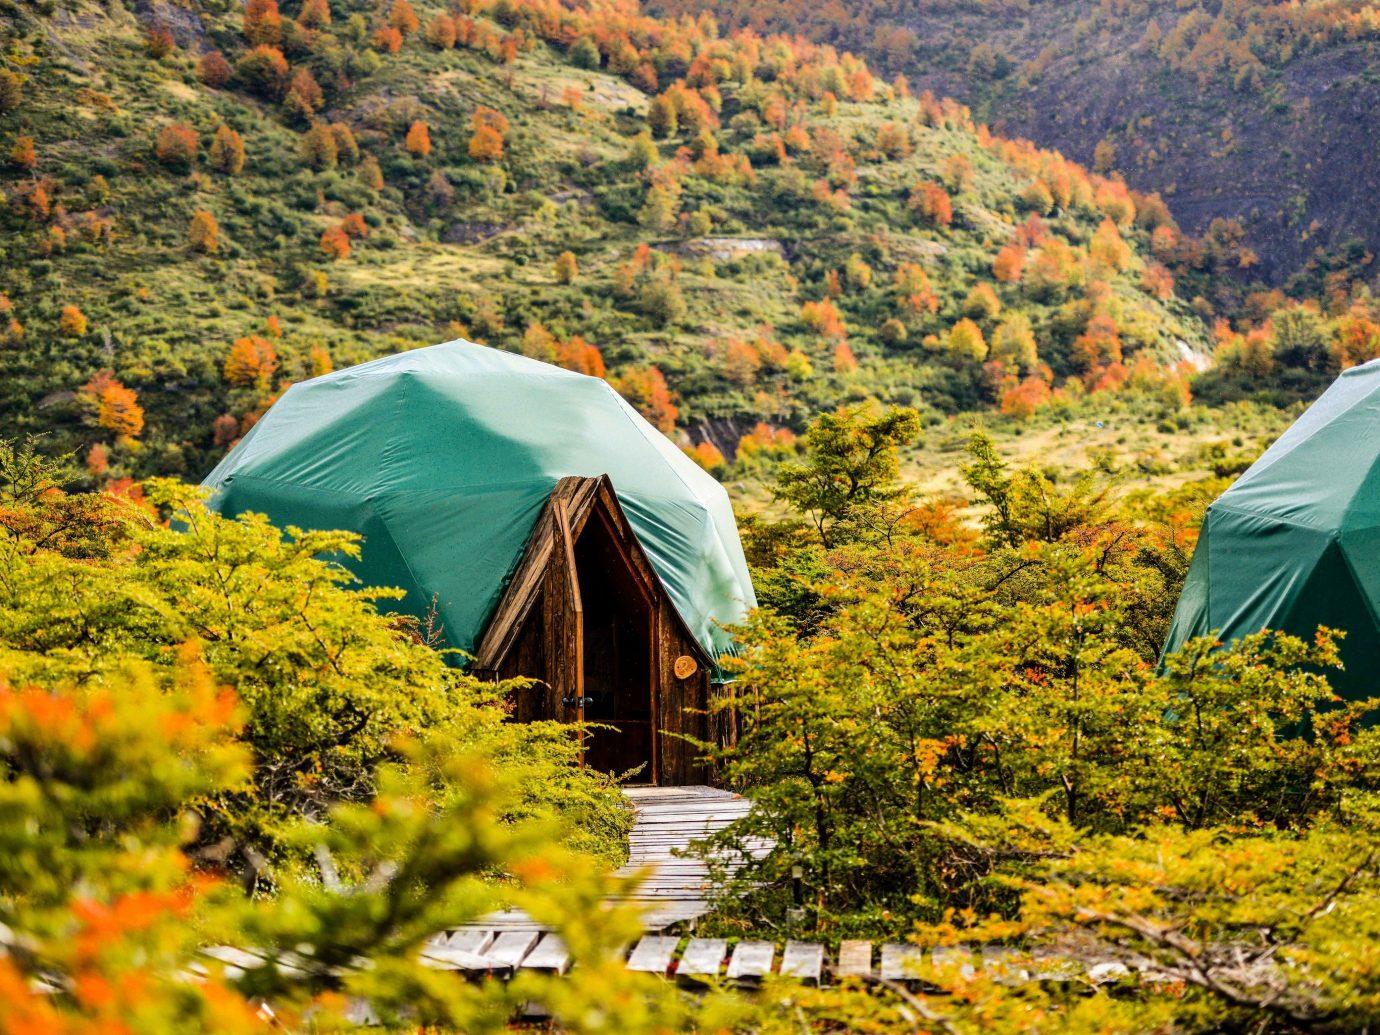 Nature wilderness leaf ecosystem plant tree autumn biome national park landscape hut grass mountain hill field plant community tent sky